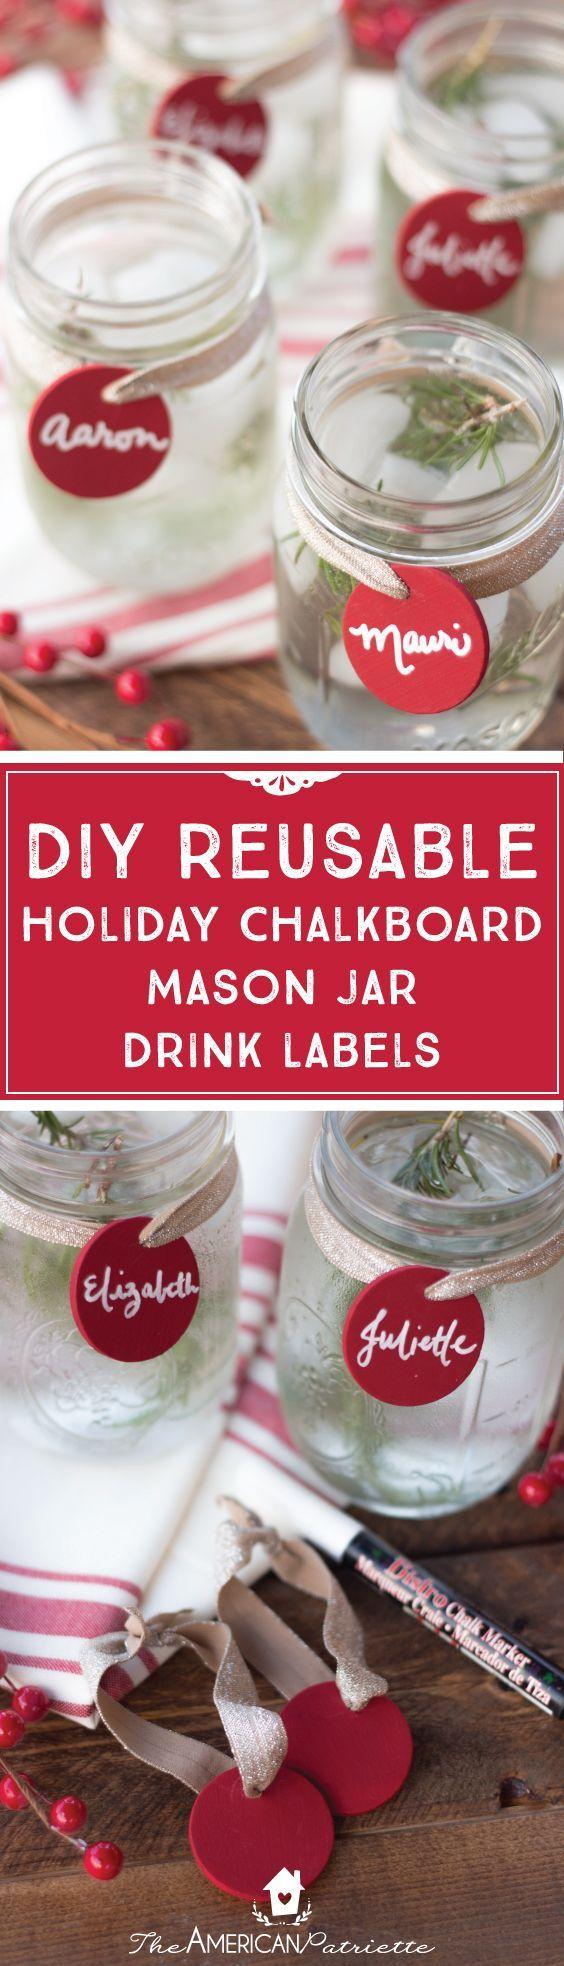 DIY Reusable Christmas Chalkboard Mason Jar Drink Labels; Easy Homemade Christmas Gift Idea; Mason Jar Crafts; Mason Jar Christmas Gifts; DIY Hostess Gifts; Handmade Gift Ideas